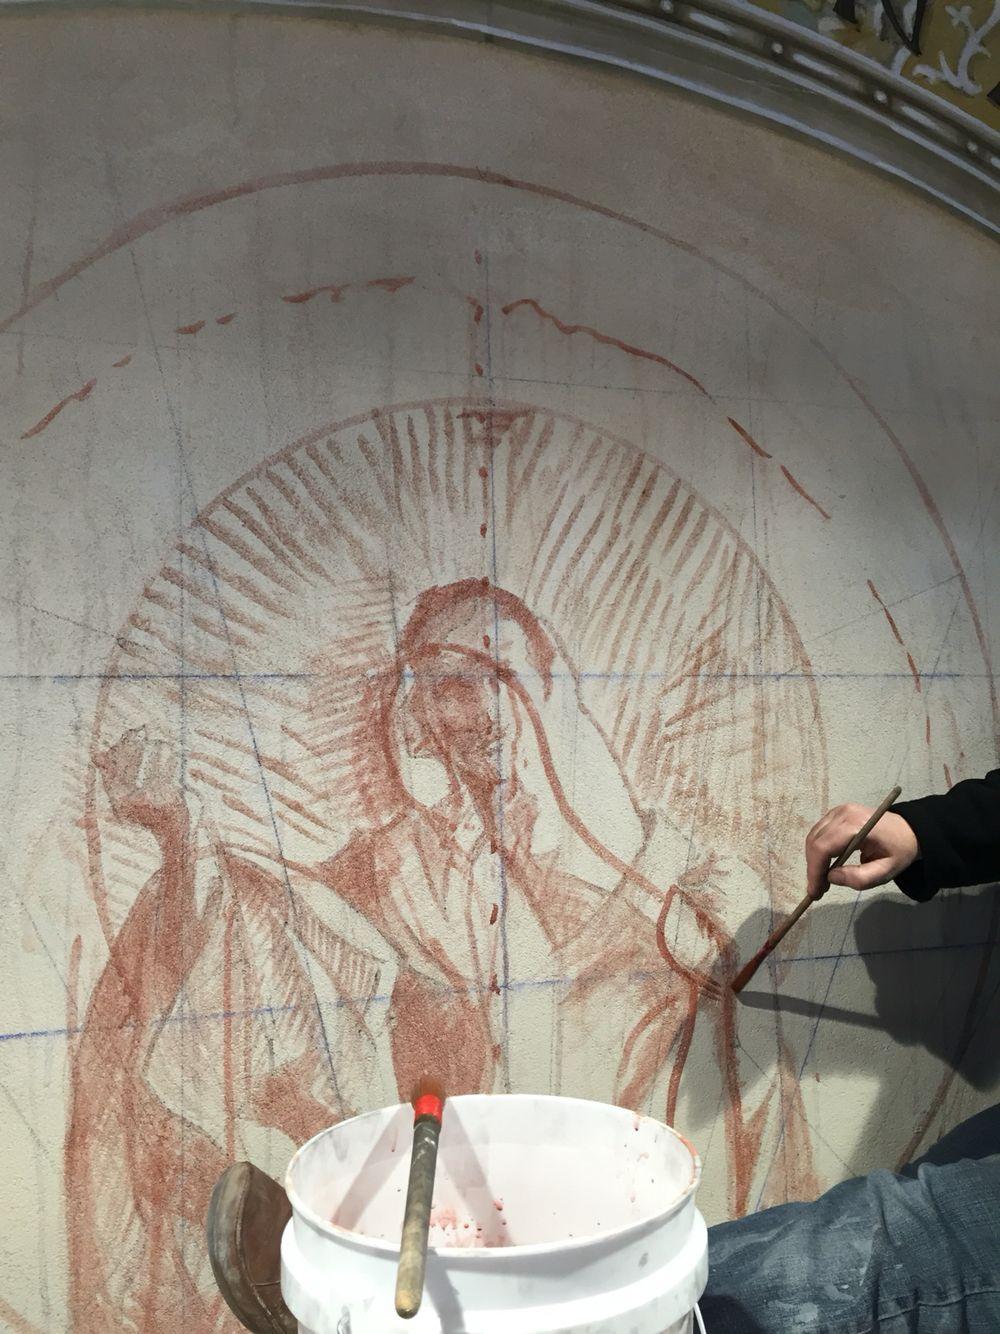 Ioana Belcea adjusts Sinopia in preparation for the painting of the main part of the fresco.  #frescoschool #sinopia #fresco #frescopainting #frescoschool #frescotechnique #setonschoolfresco #virginiafresco